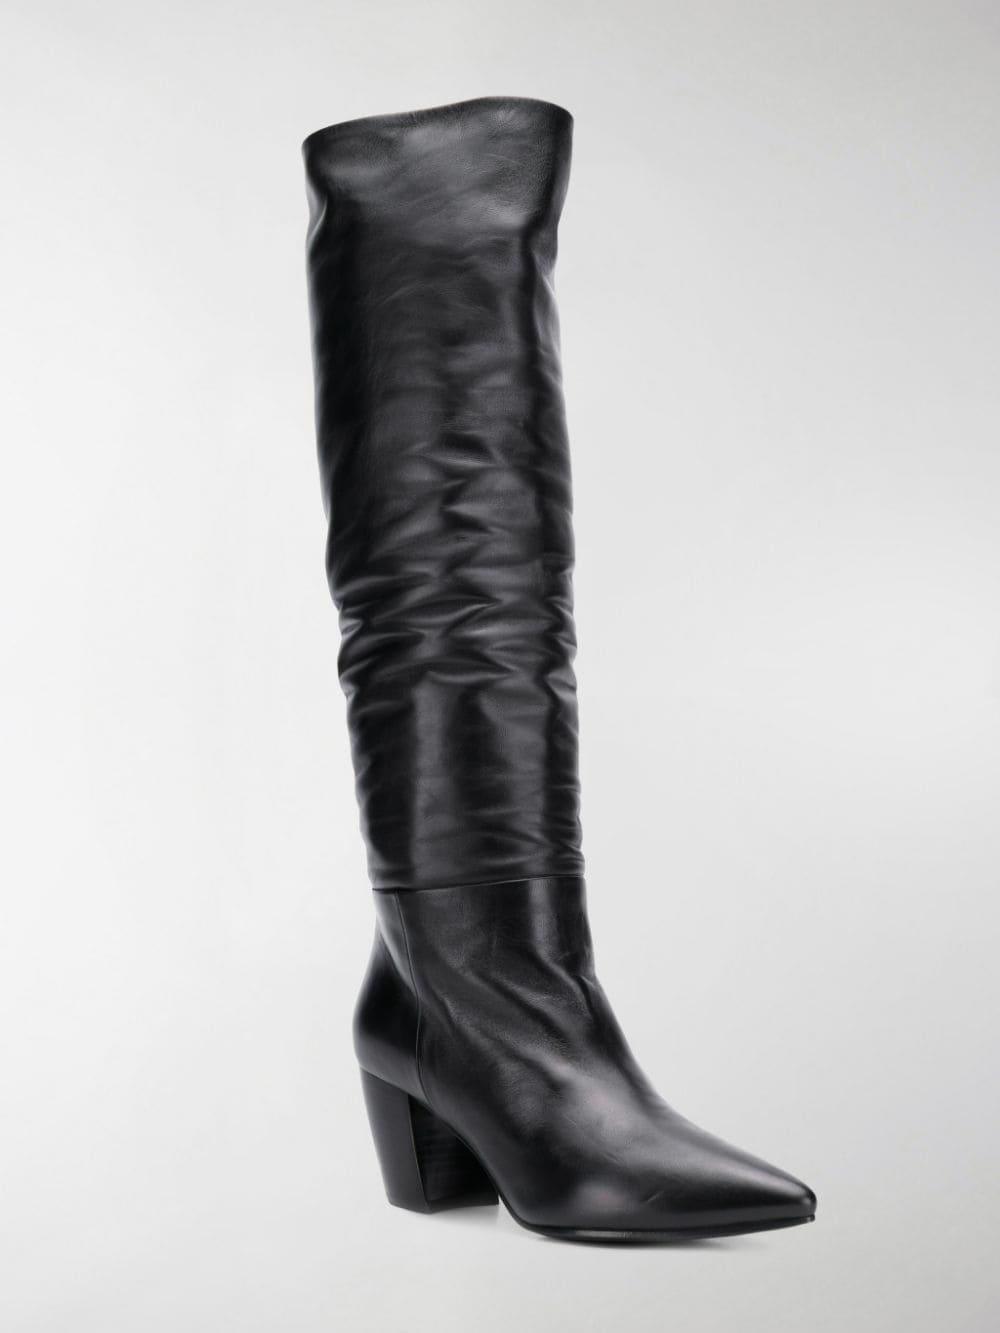 Prada Leather Crinkle-effect Knee-high Boots in Black